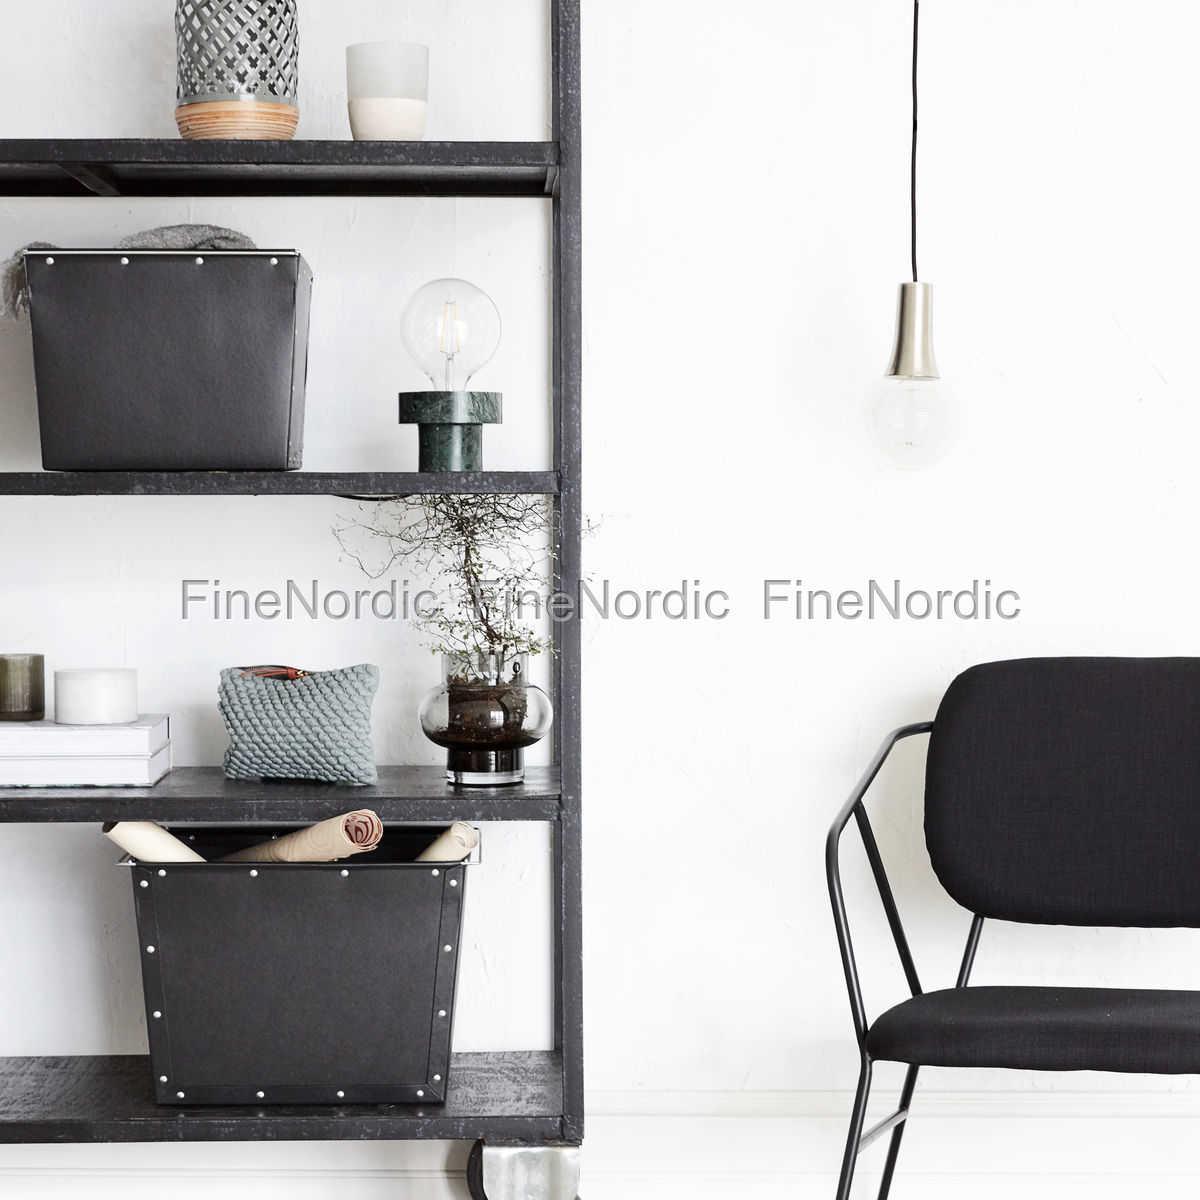 house doctor aufbewahrungs box 1 schwarz set in 2 gr en. Black Bedroom Furniture Sets. Home Design Ideas